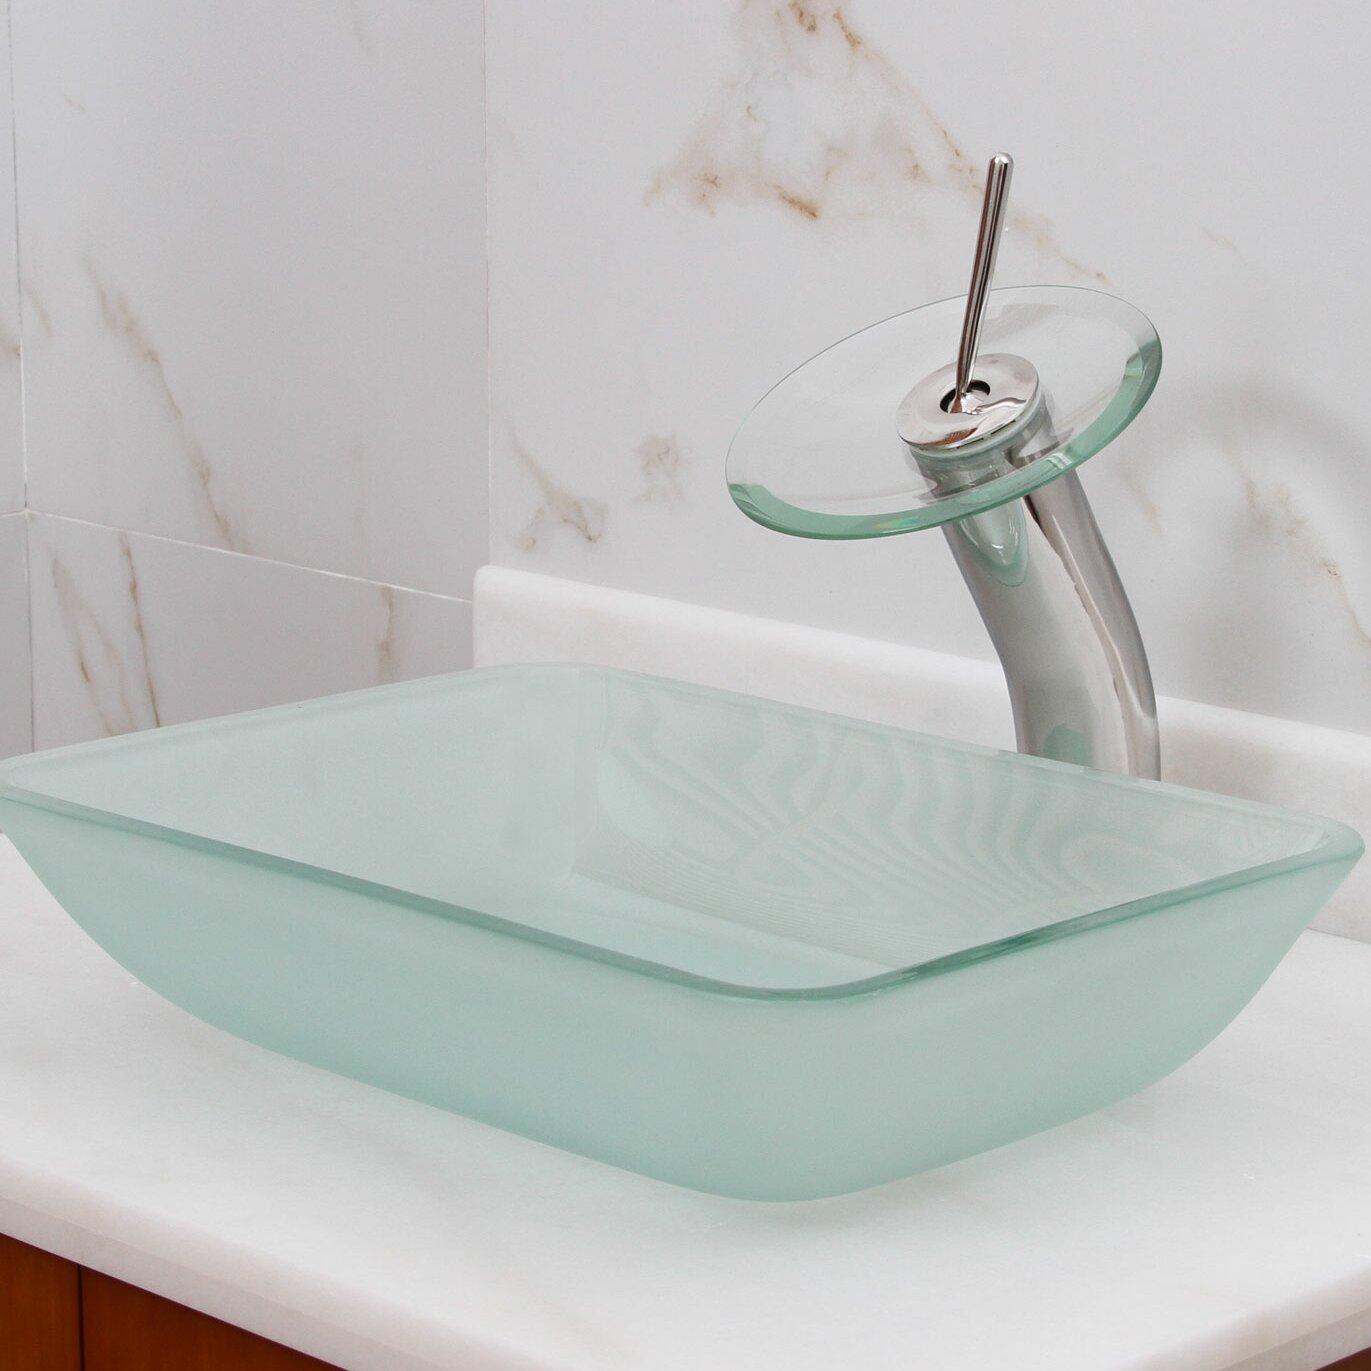 Elimaxs Elite Frosted Tempered Rectangular Glass Vessel Bathroom Sink Reviews Wayfair